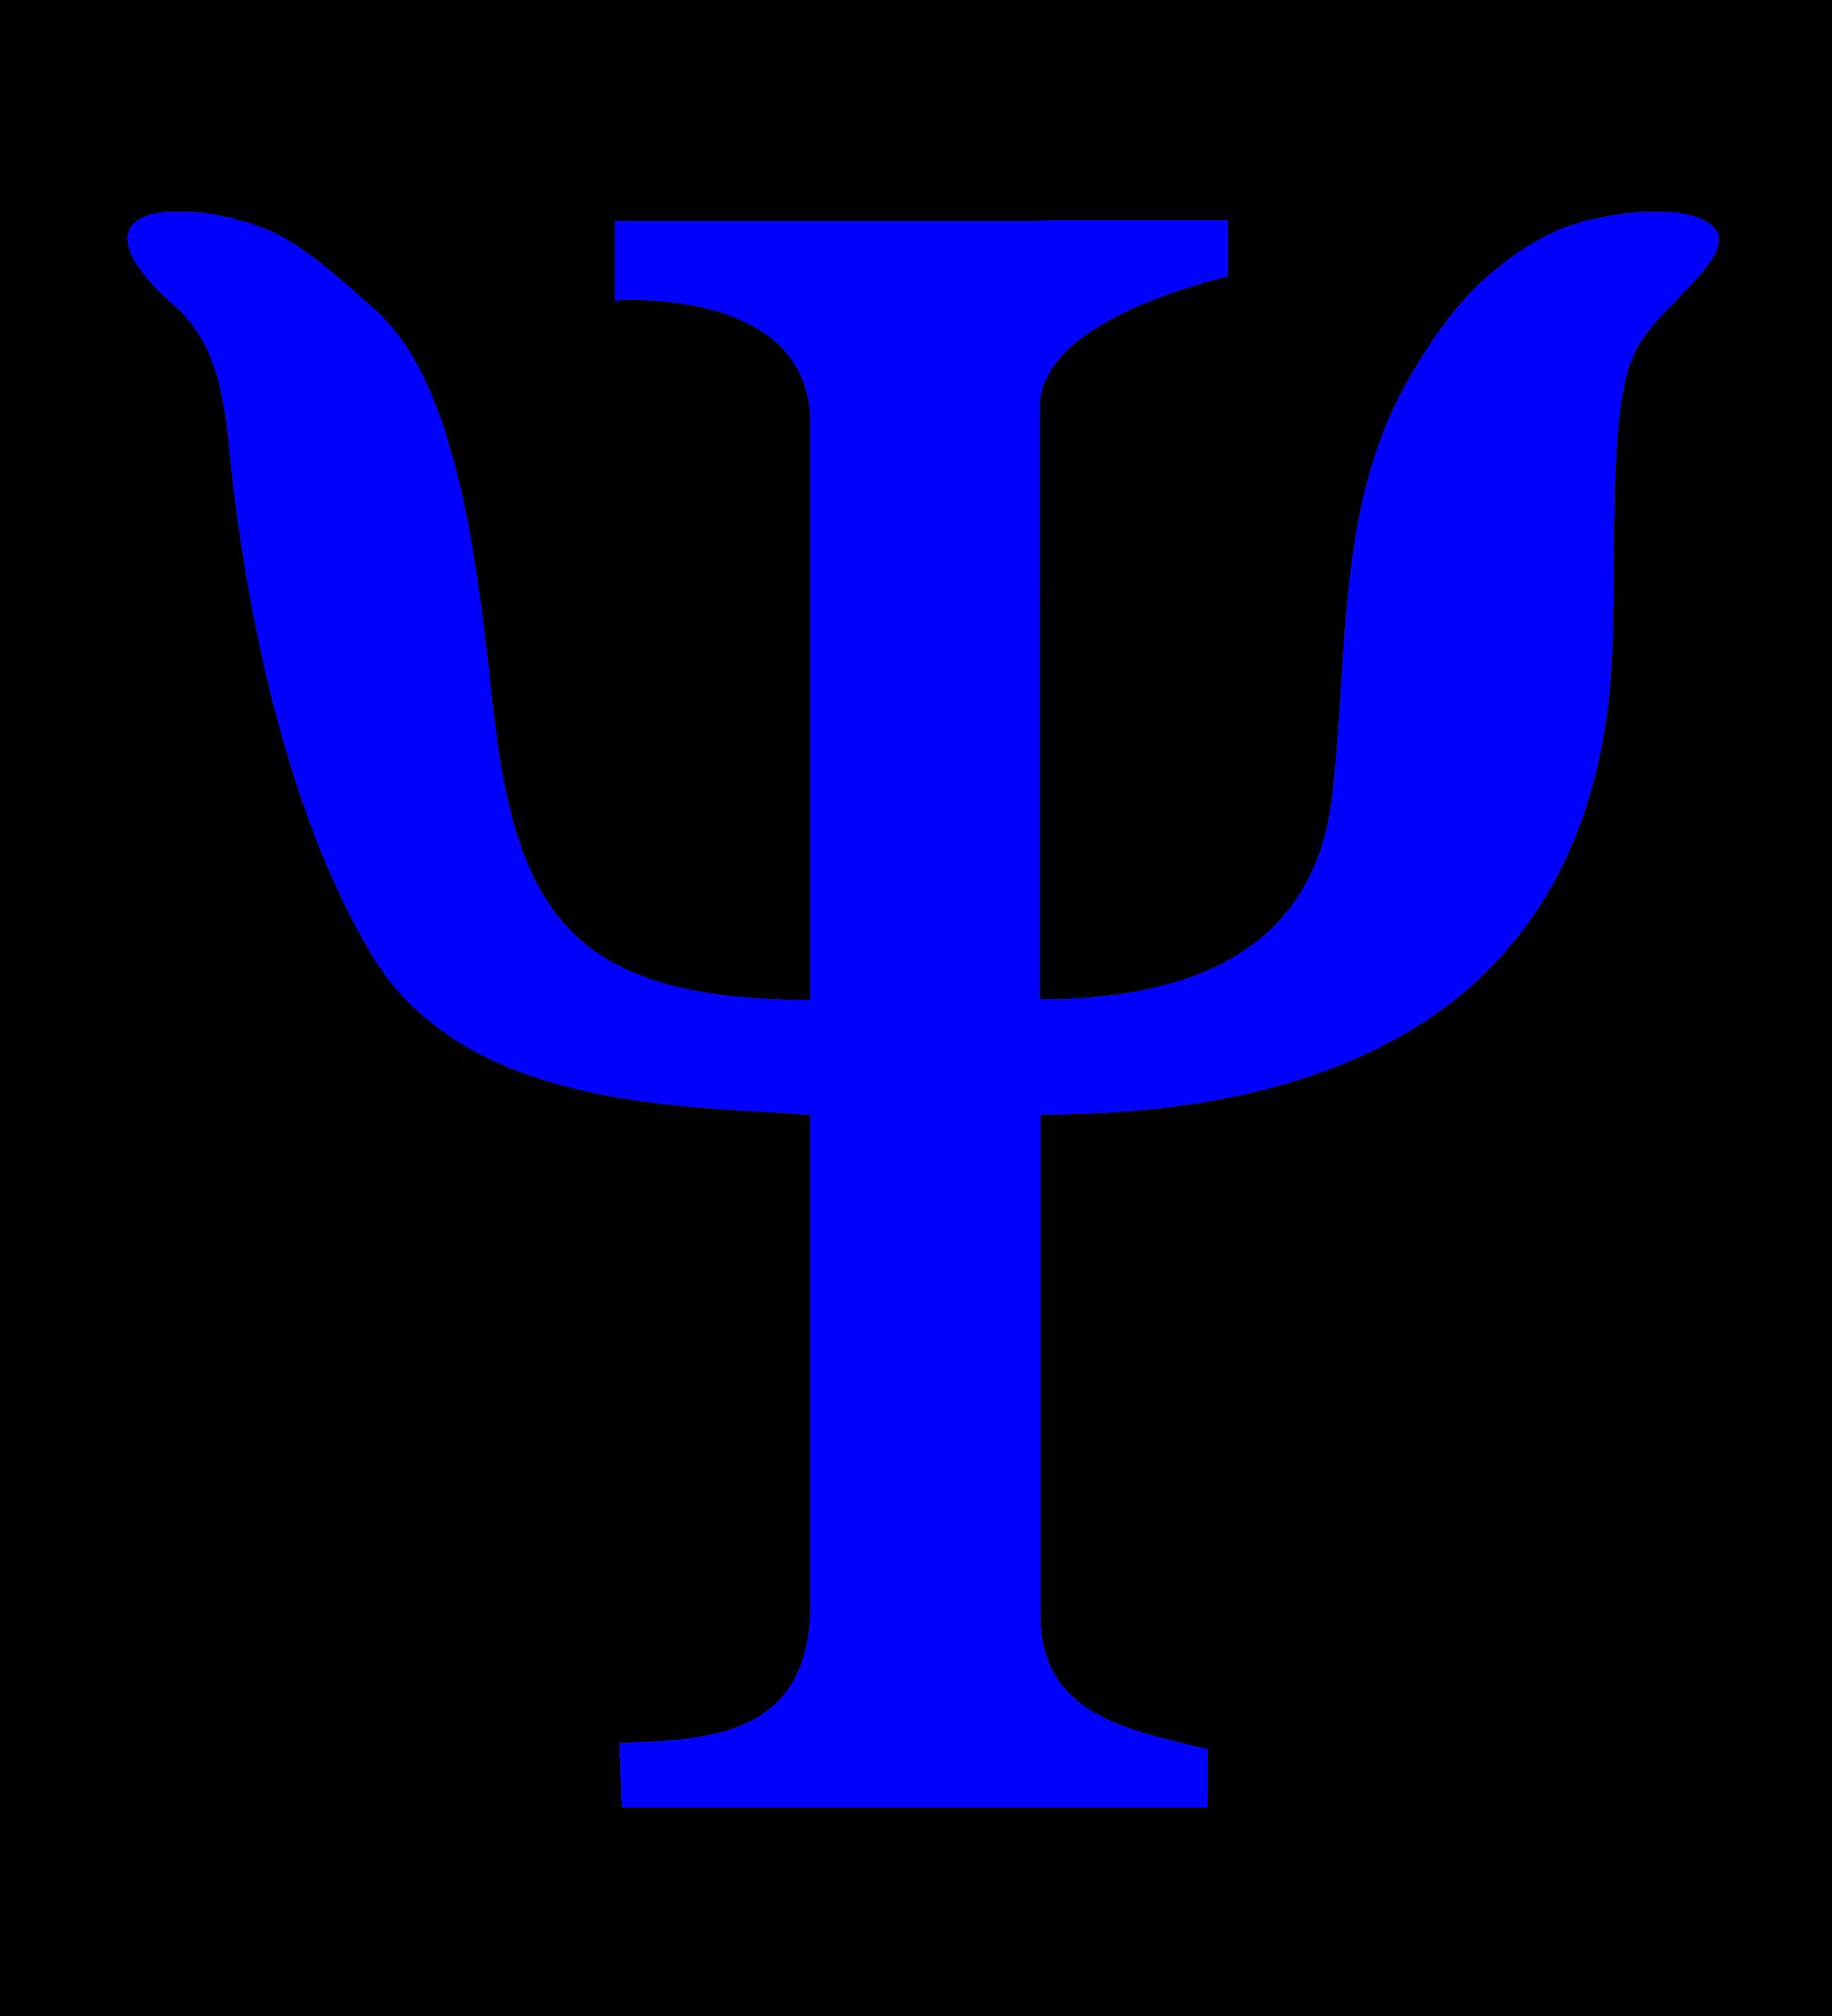 Logos download symbol blue. Psychology clipart psychology logo